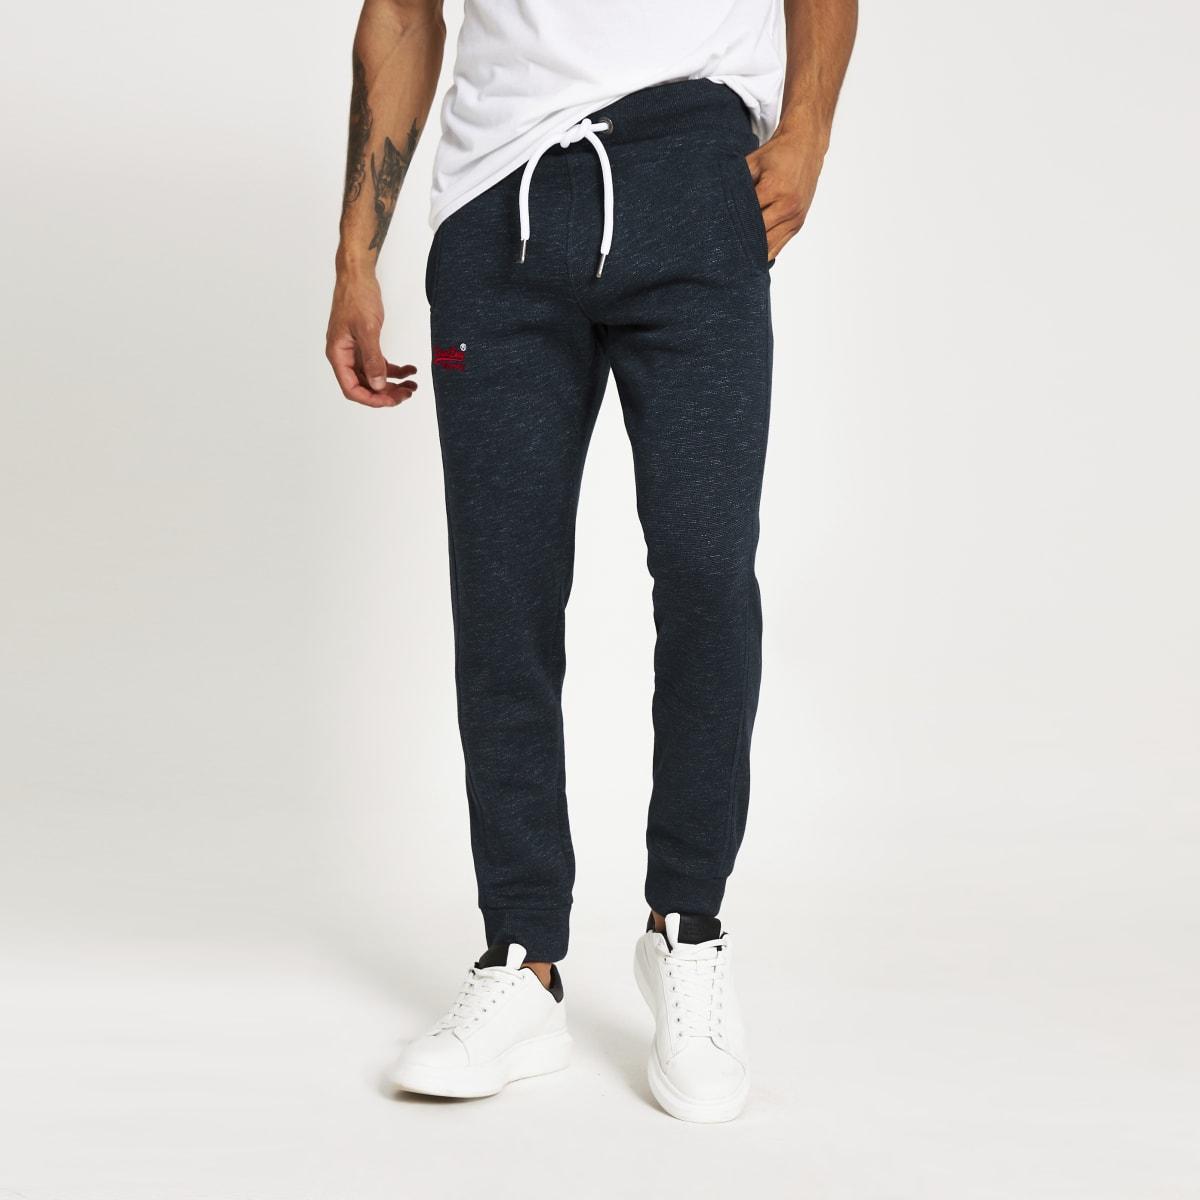 Superdry- Pantalons de jogging bleu marine Orange Label Classic